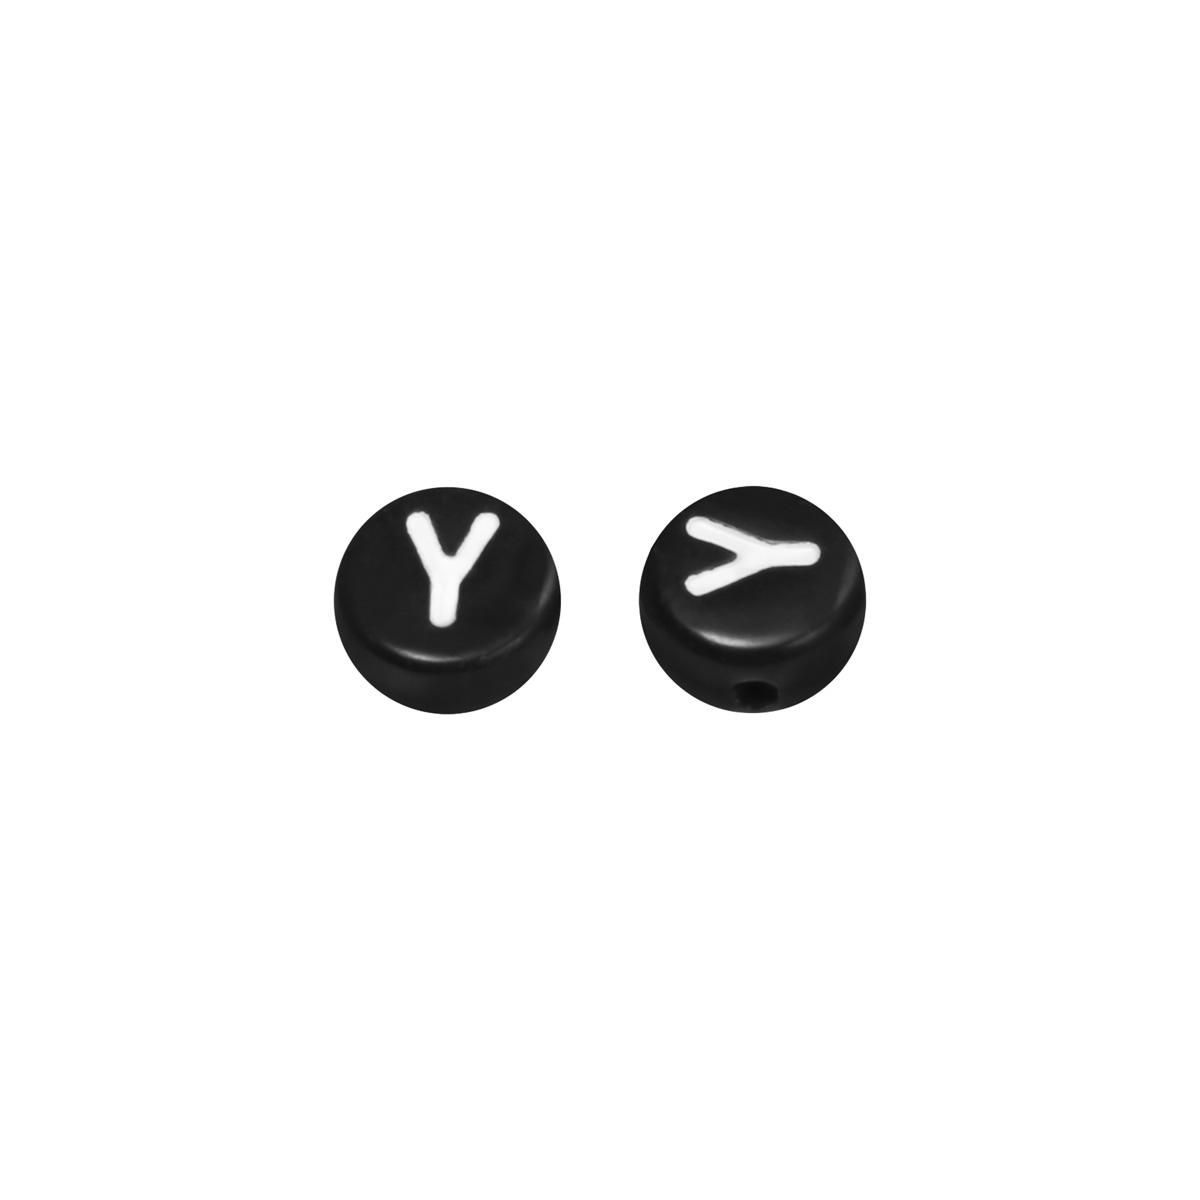 Diy flat beads letter y - 7mm